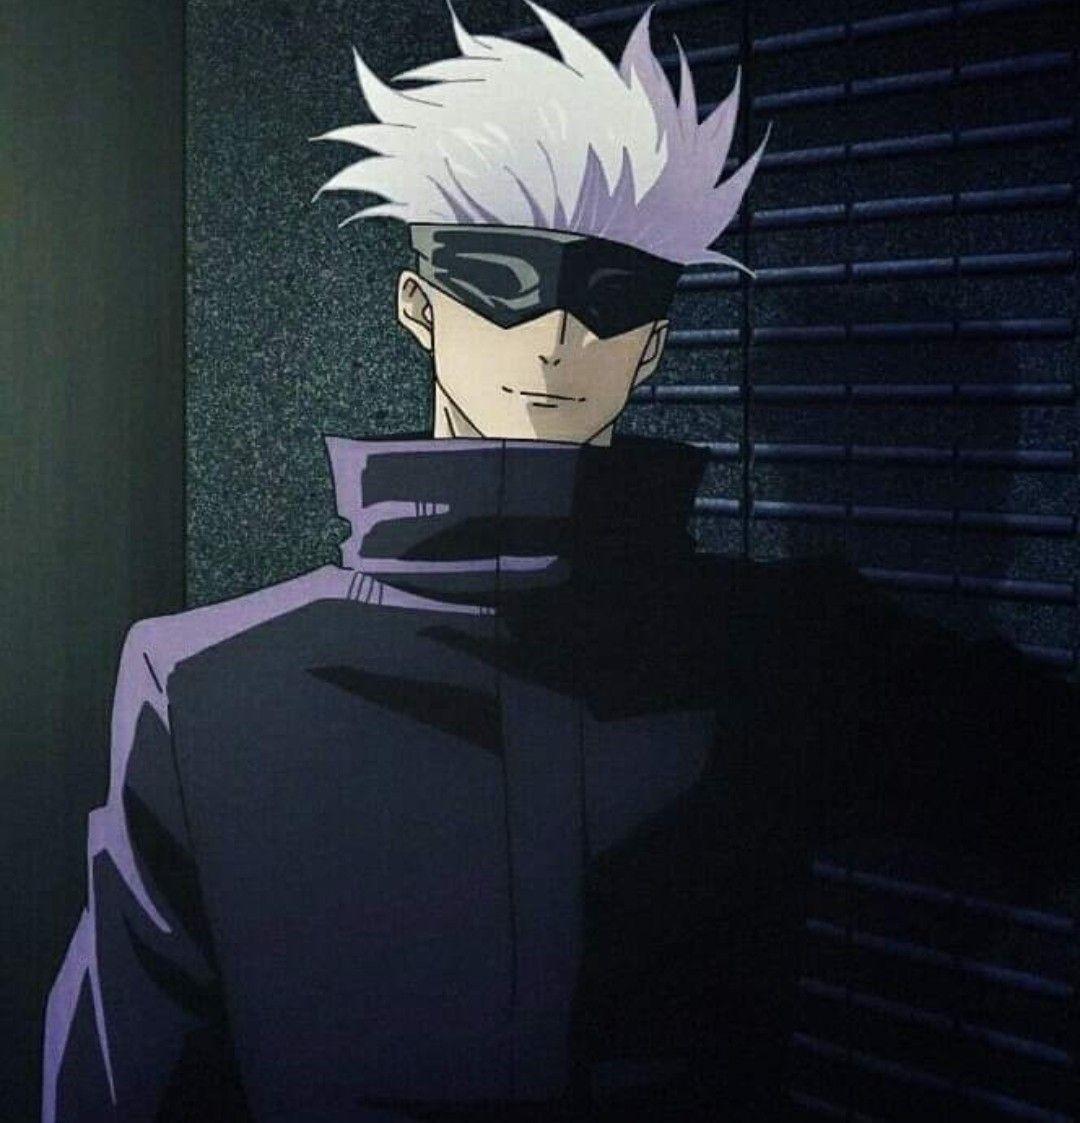 Jujutsu Kaisen Icon Anime Character Design Jujutsu Anime Boy Hair